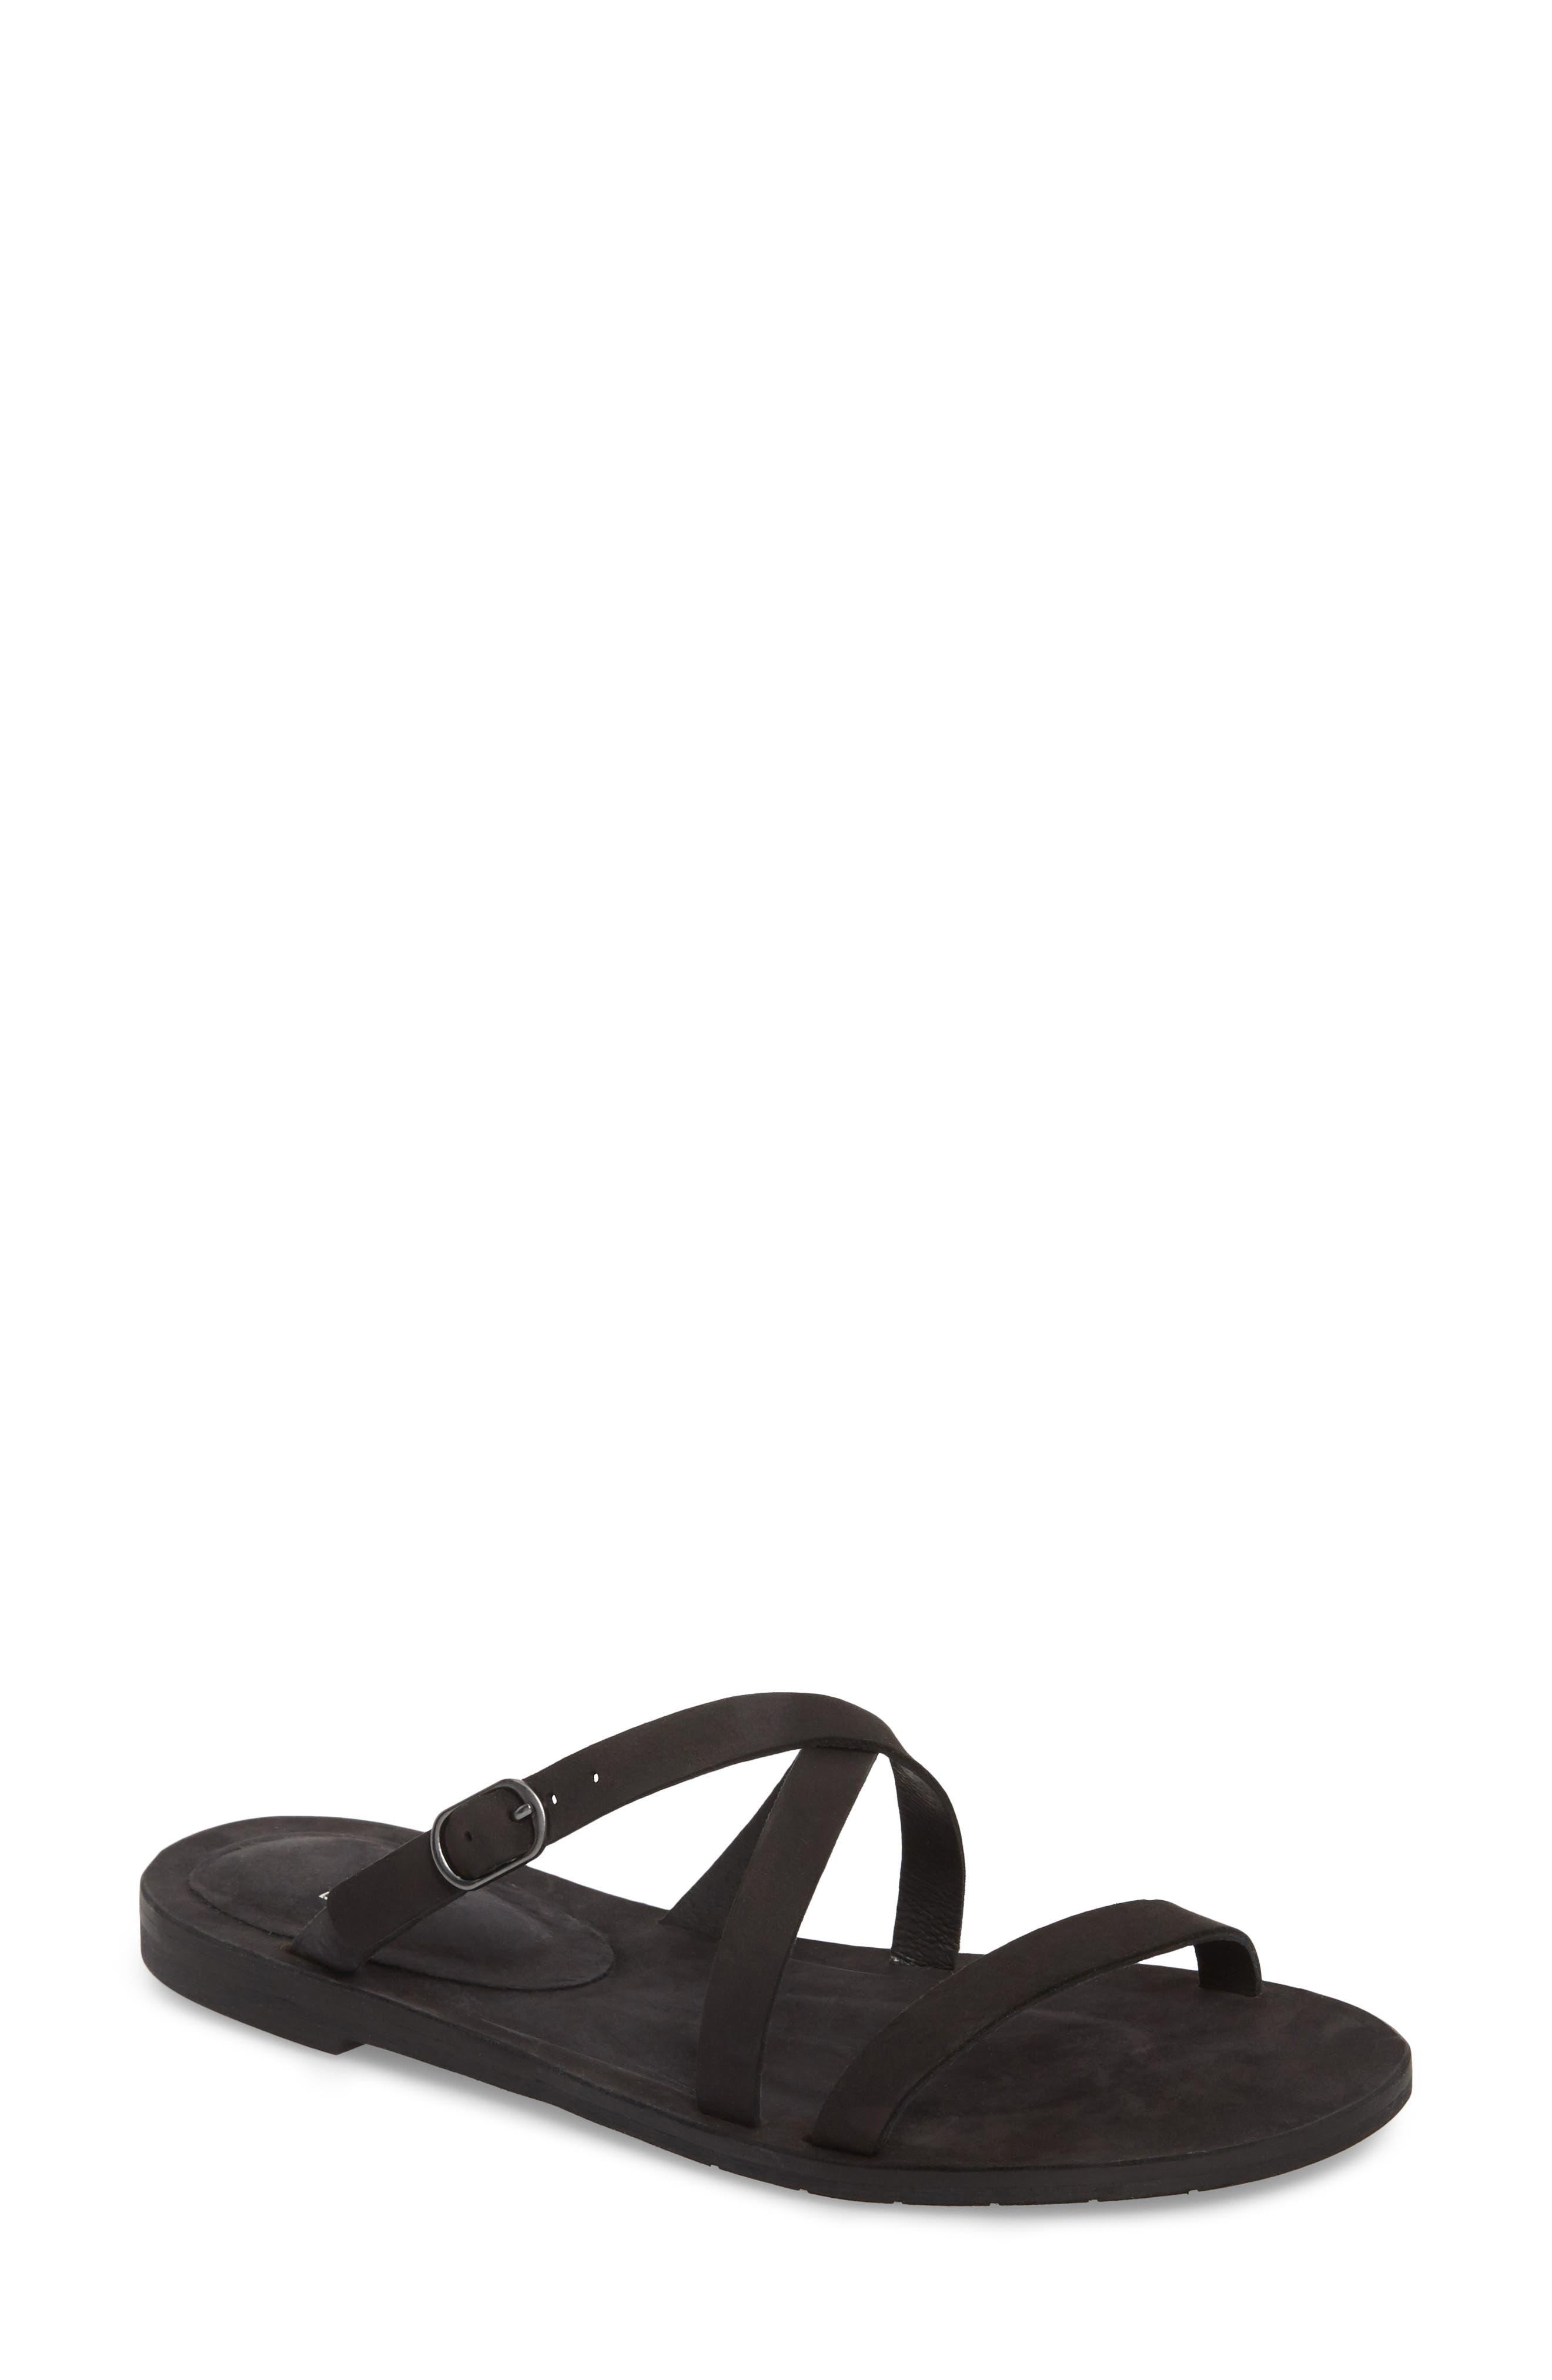 Dali Strappy Slide Sandal,                         Main,                         color,